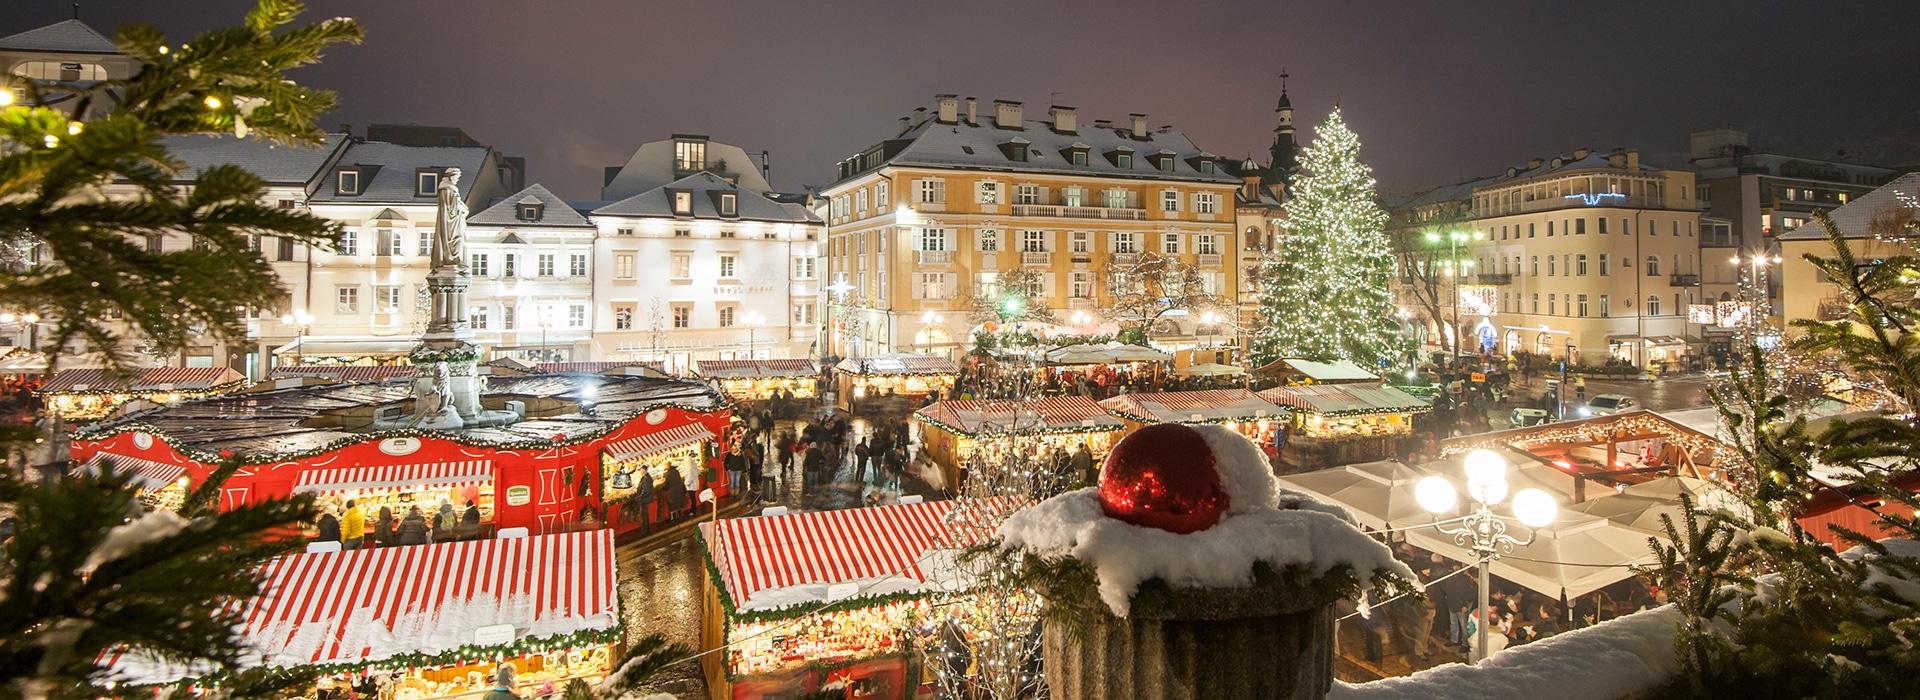 Weihnachtsmarkt Bozen © Tv Bozen